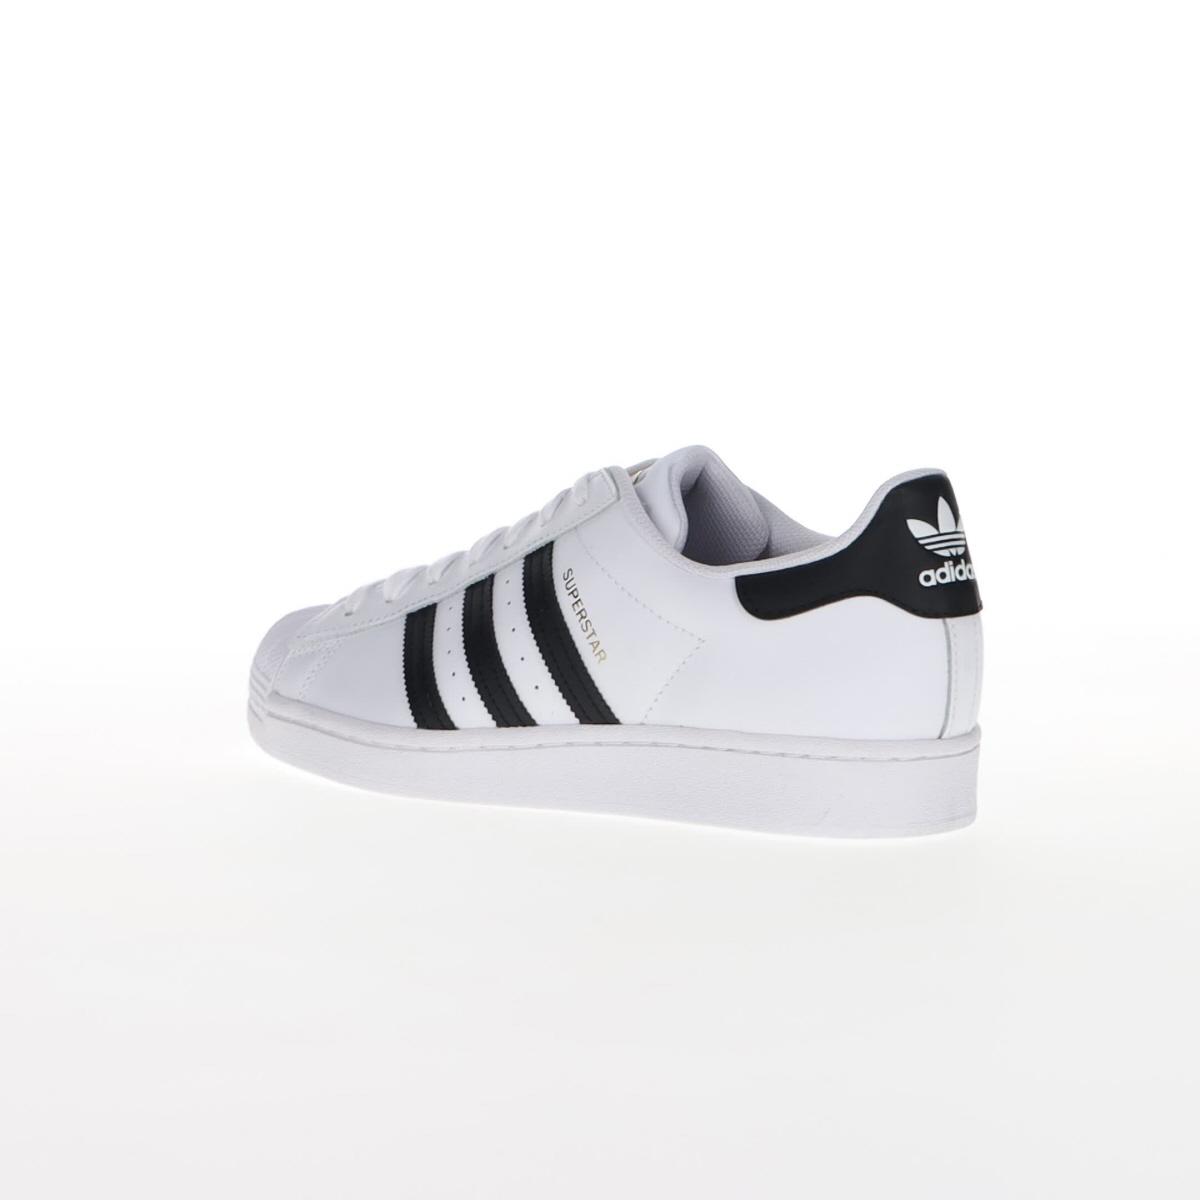 amazon adidas edge lux shoes black women skechers